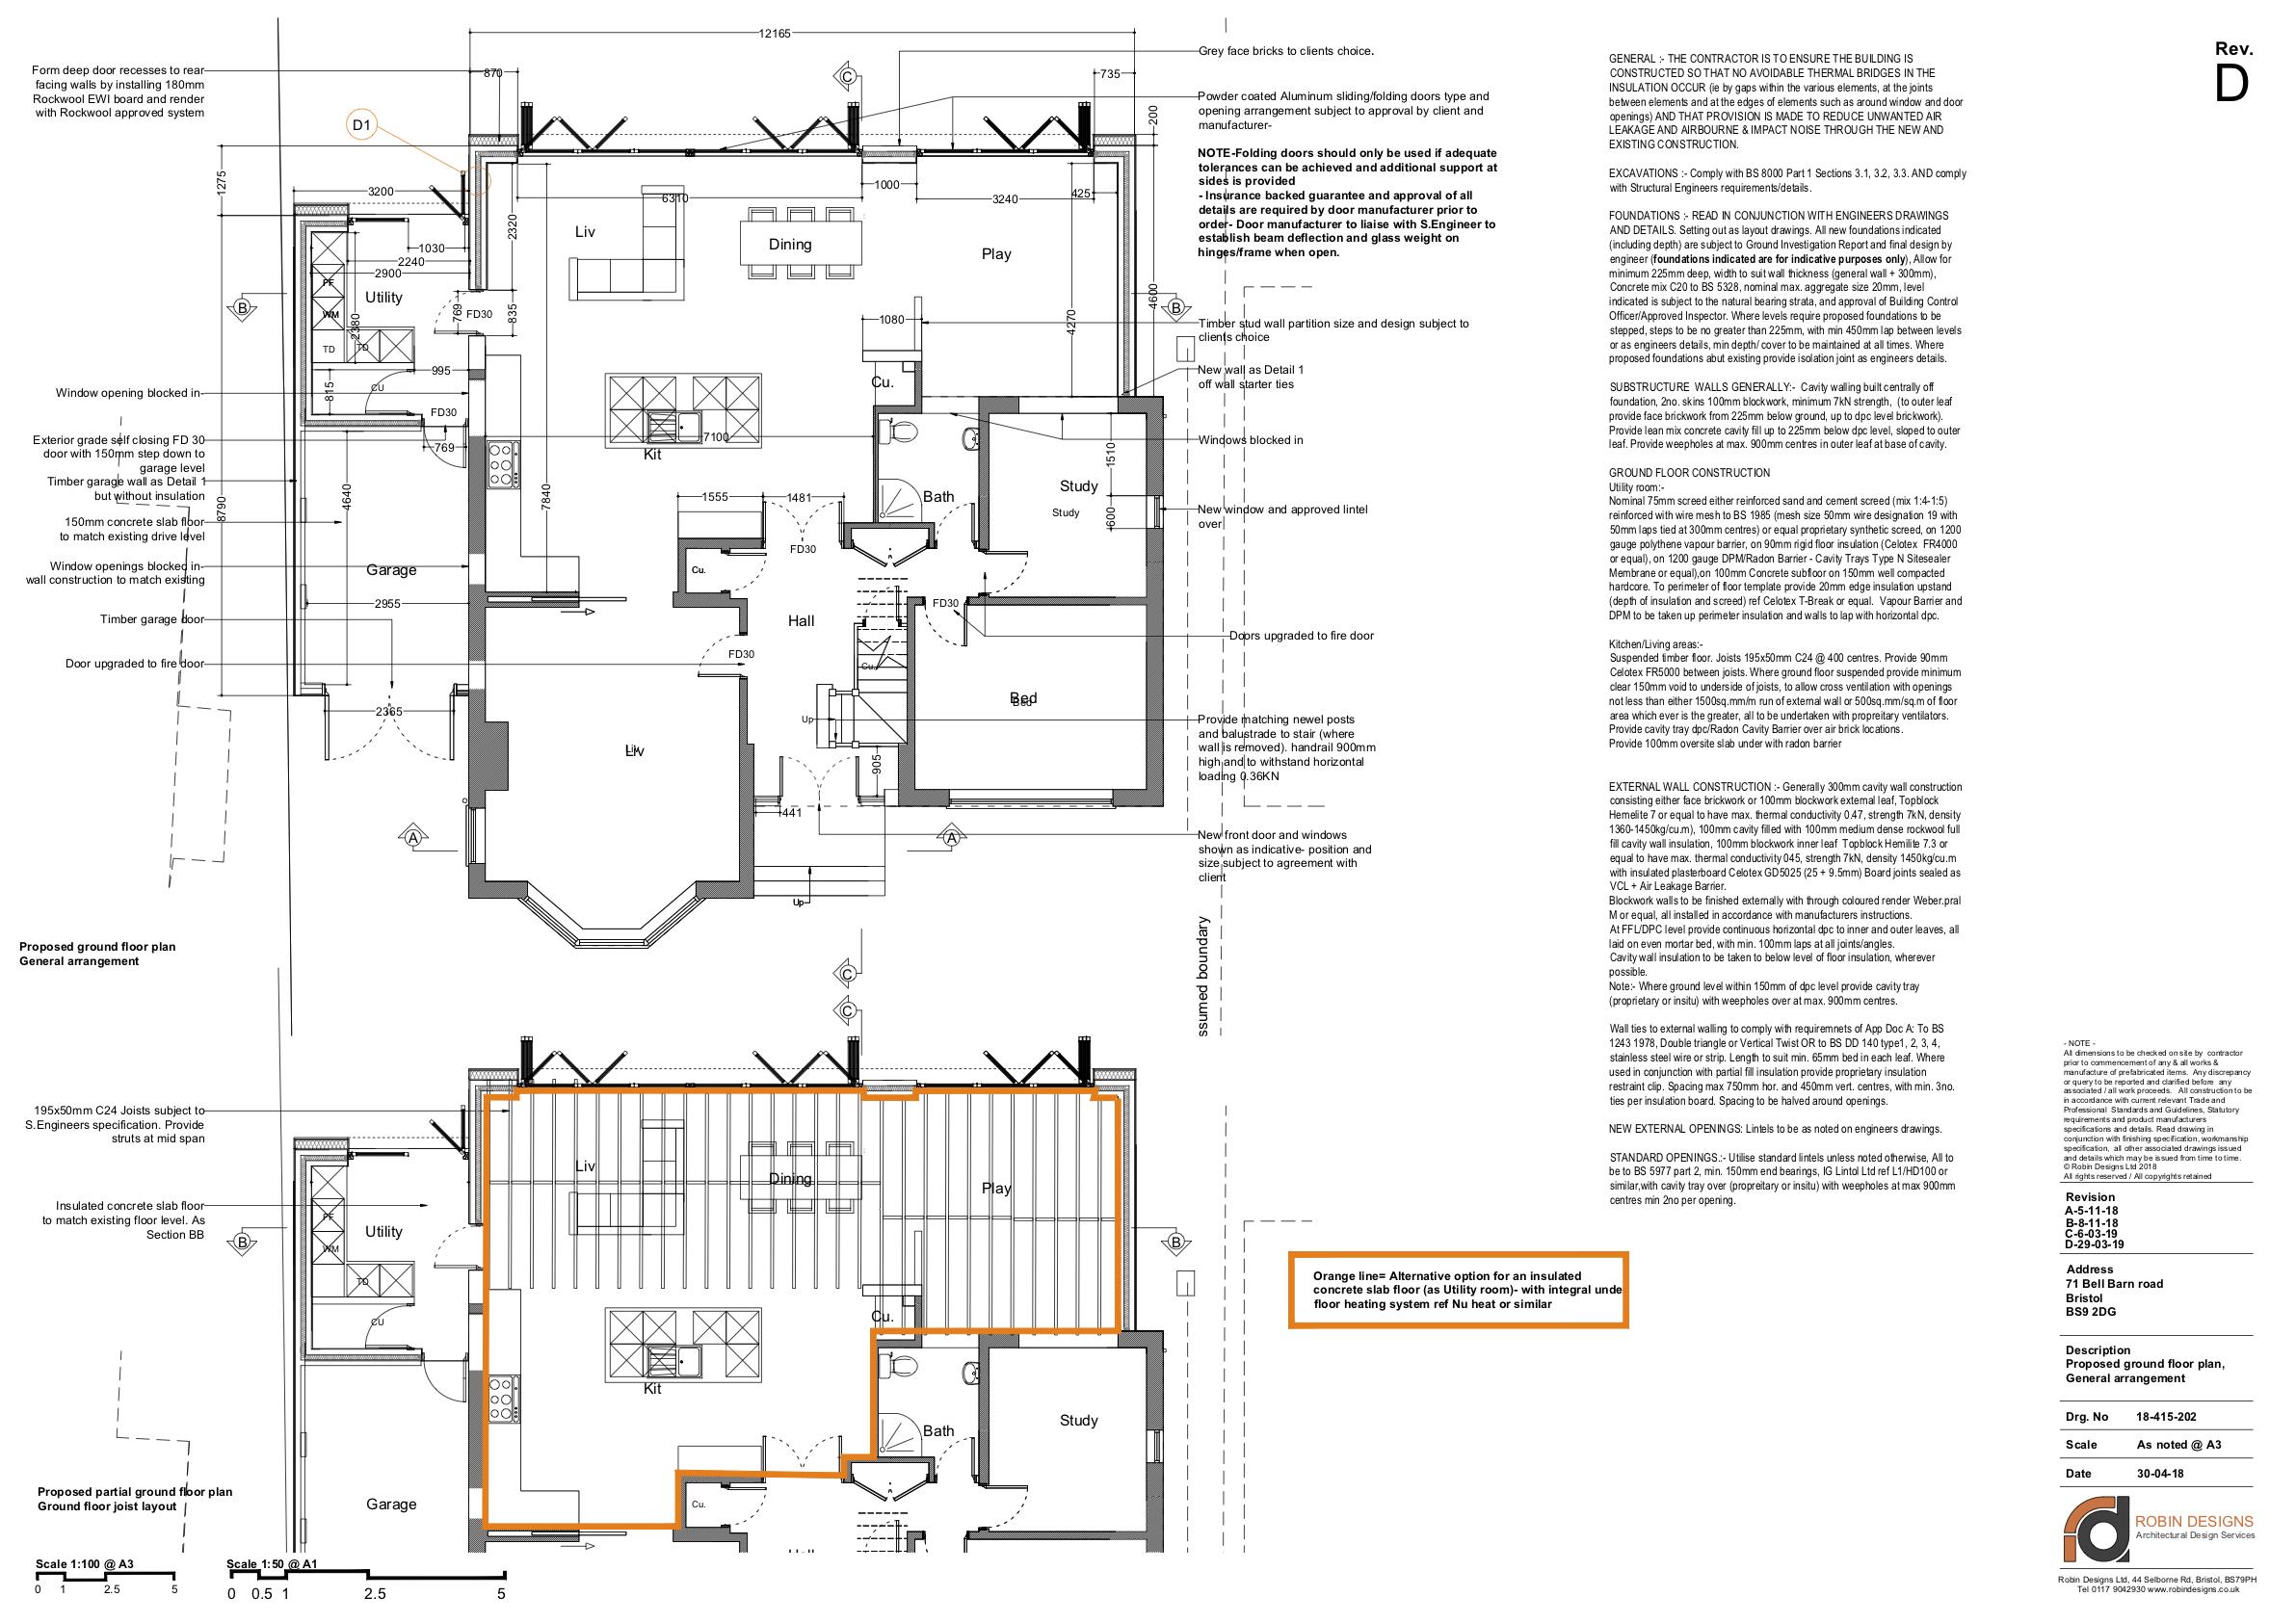 71 Bell barn construction drawings 29-03-19-202 GF Gen.png